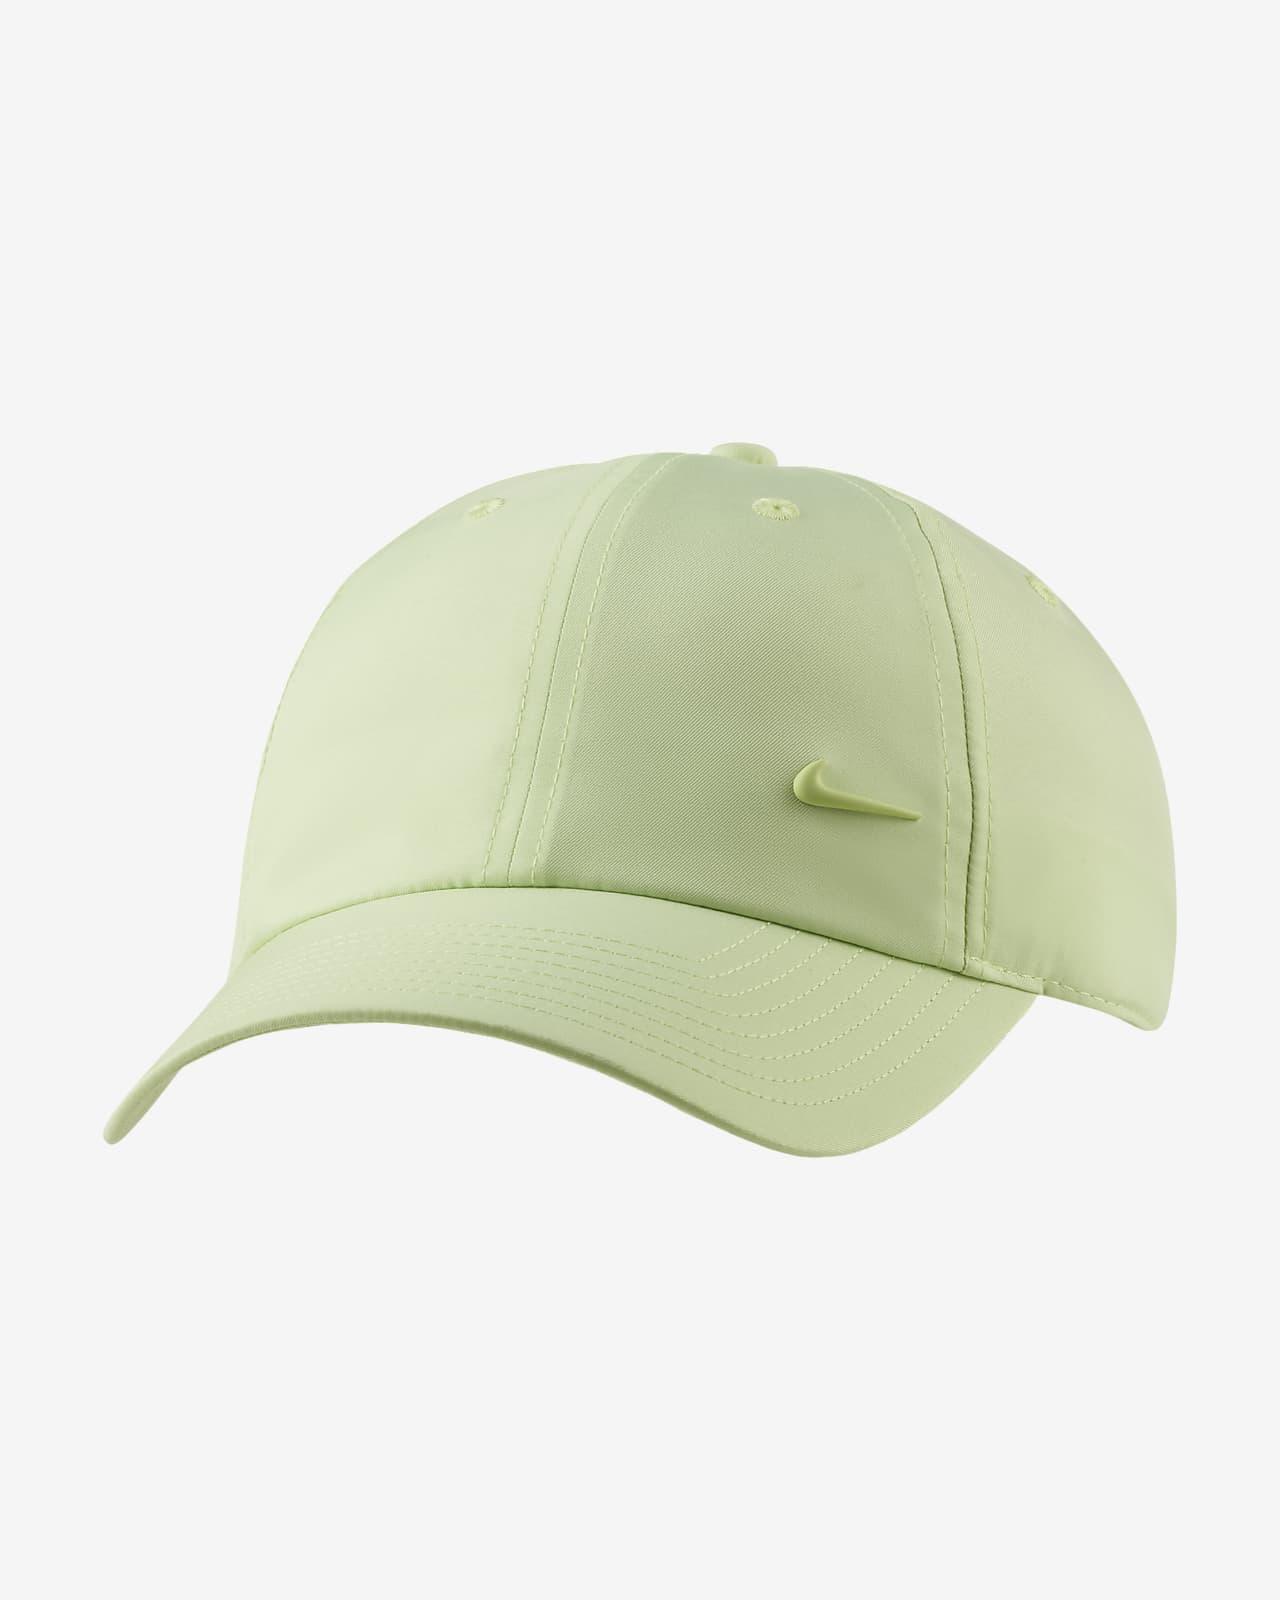 Nike Sportswear Heritage 86 Cap (Unisex)